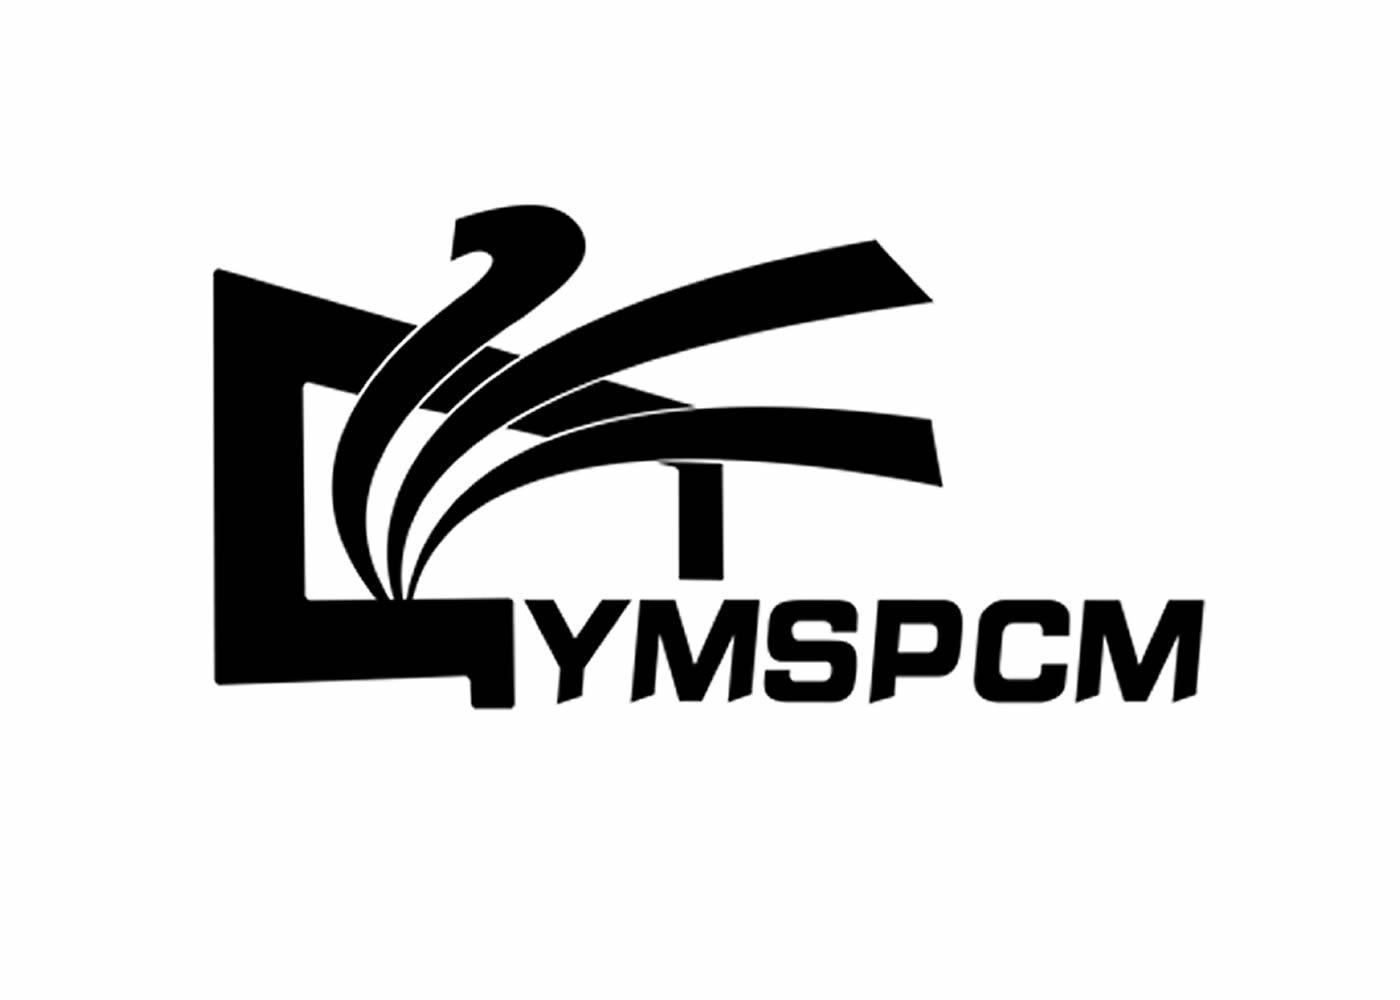 logo logo 标志 设计 图标 1400_1000图片